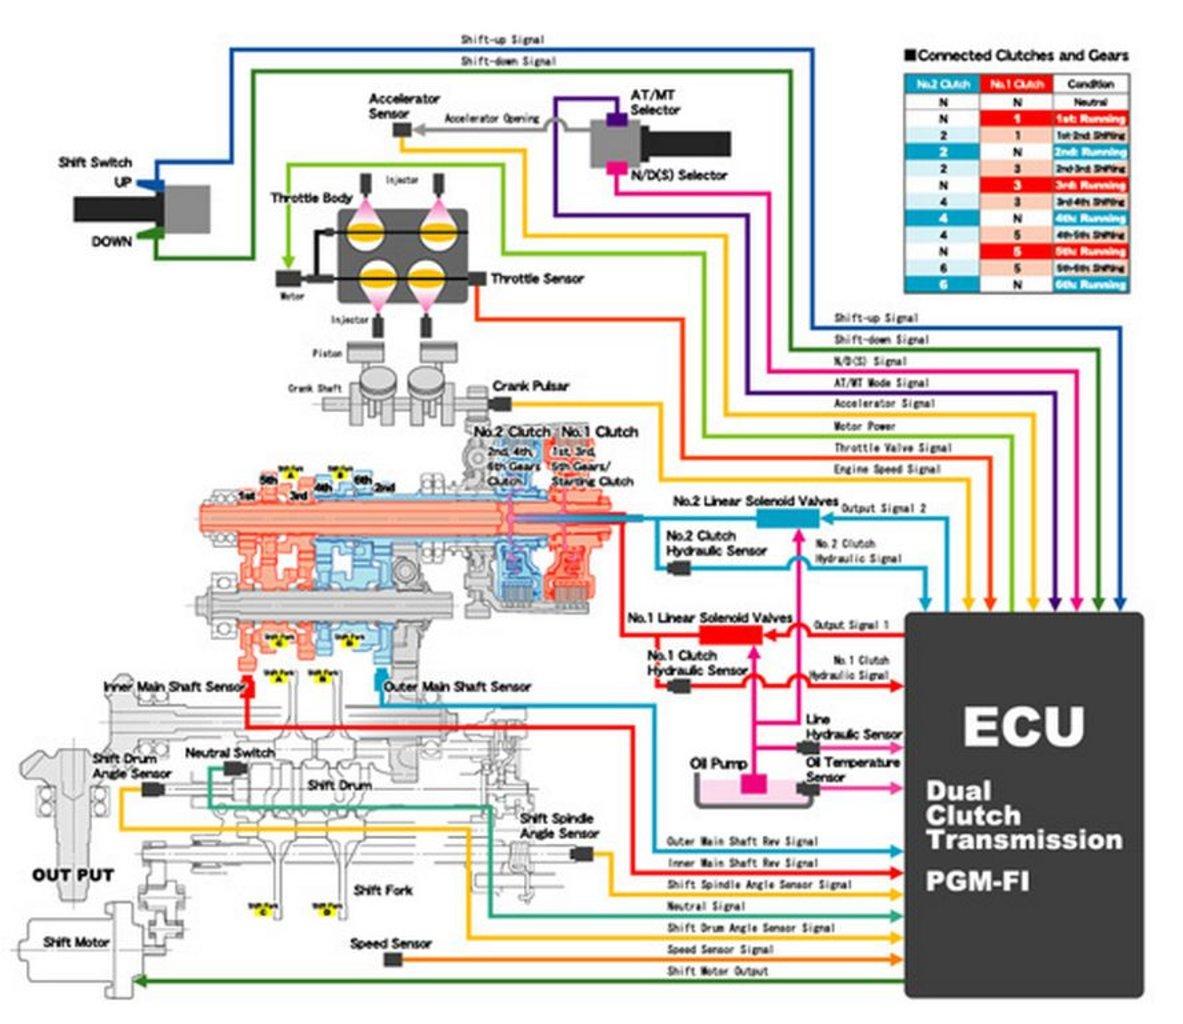 Wiring diagram honda beat new wiring diagram 2018 wiring diagram honda vario 110 gallery diagram sample and 2002 honda cr v wire harness diagram diagram kelistrikan honda beat injeksi 1992 honda civic asfbconference2016 Gallery